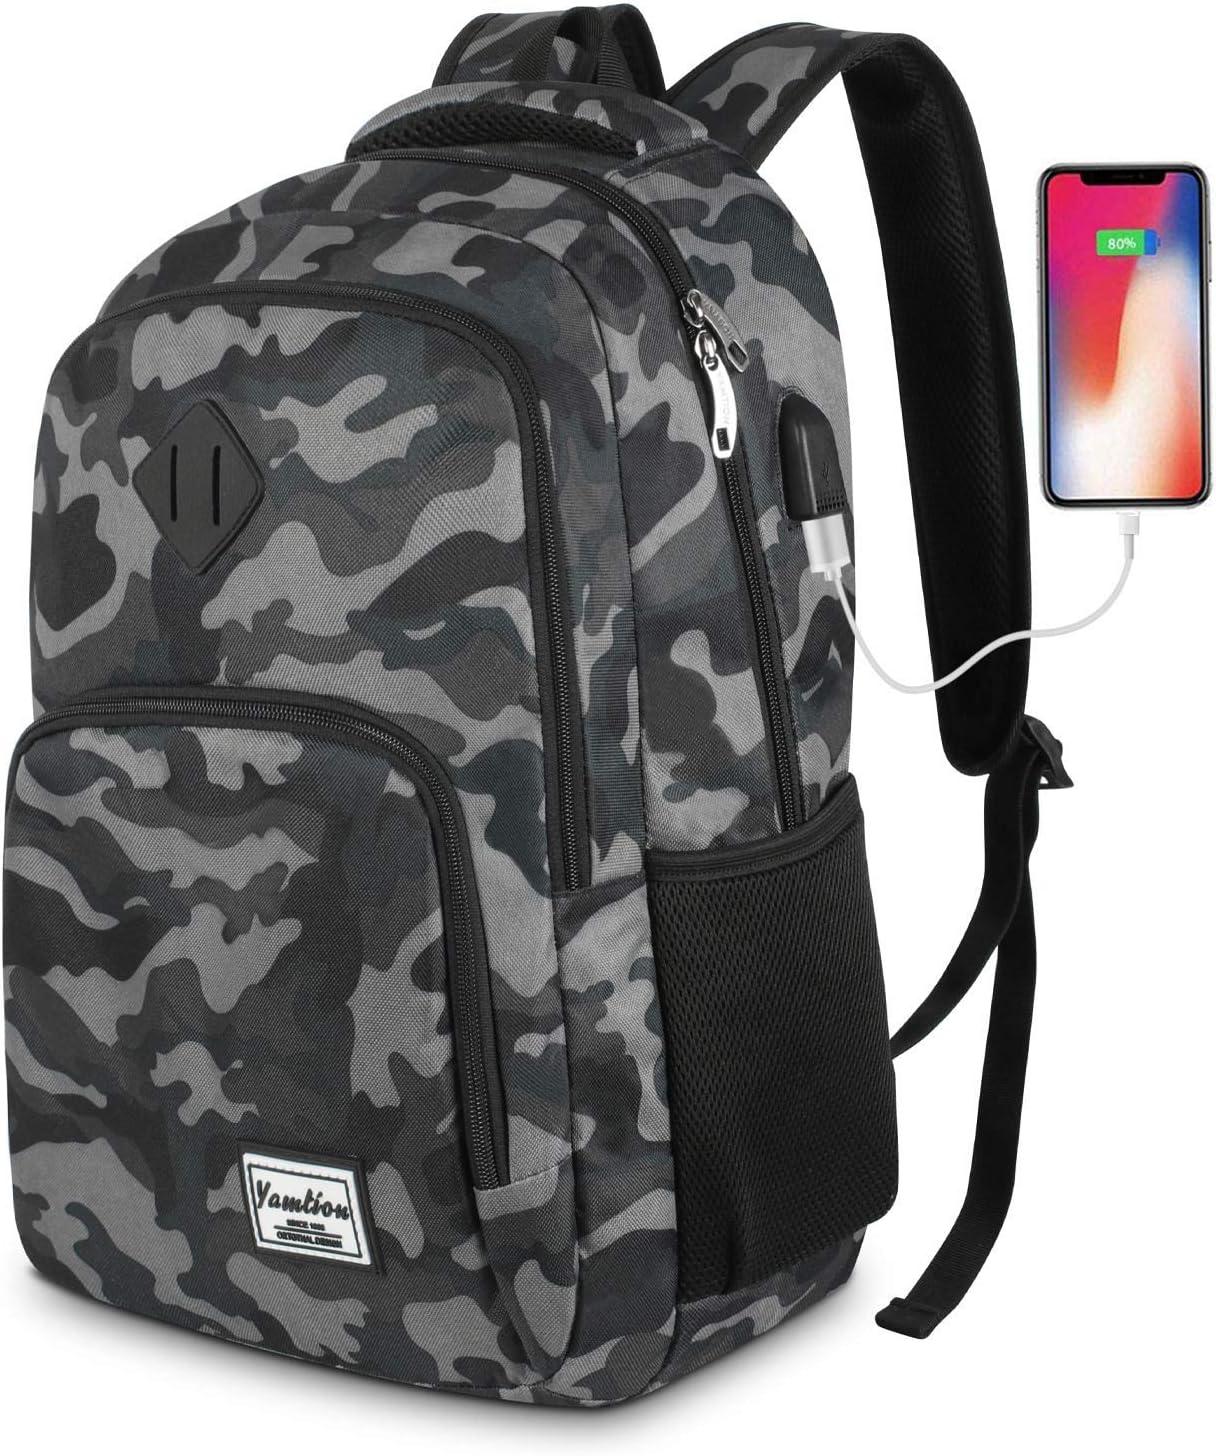 Mochila Hombre,Mochila Portatil,Mochilas Escolares Juveniles con Puerto de Carga USB (15.6 Pulgada, GJB6-camouflage Black)